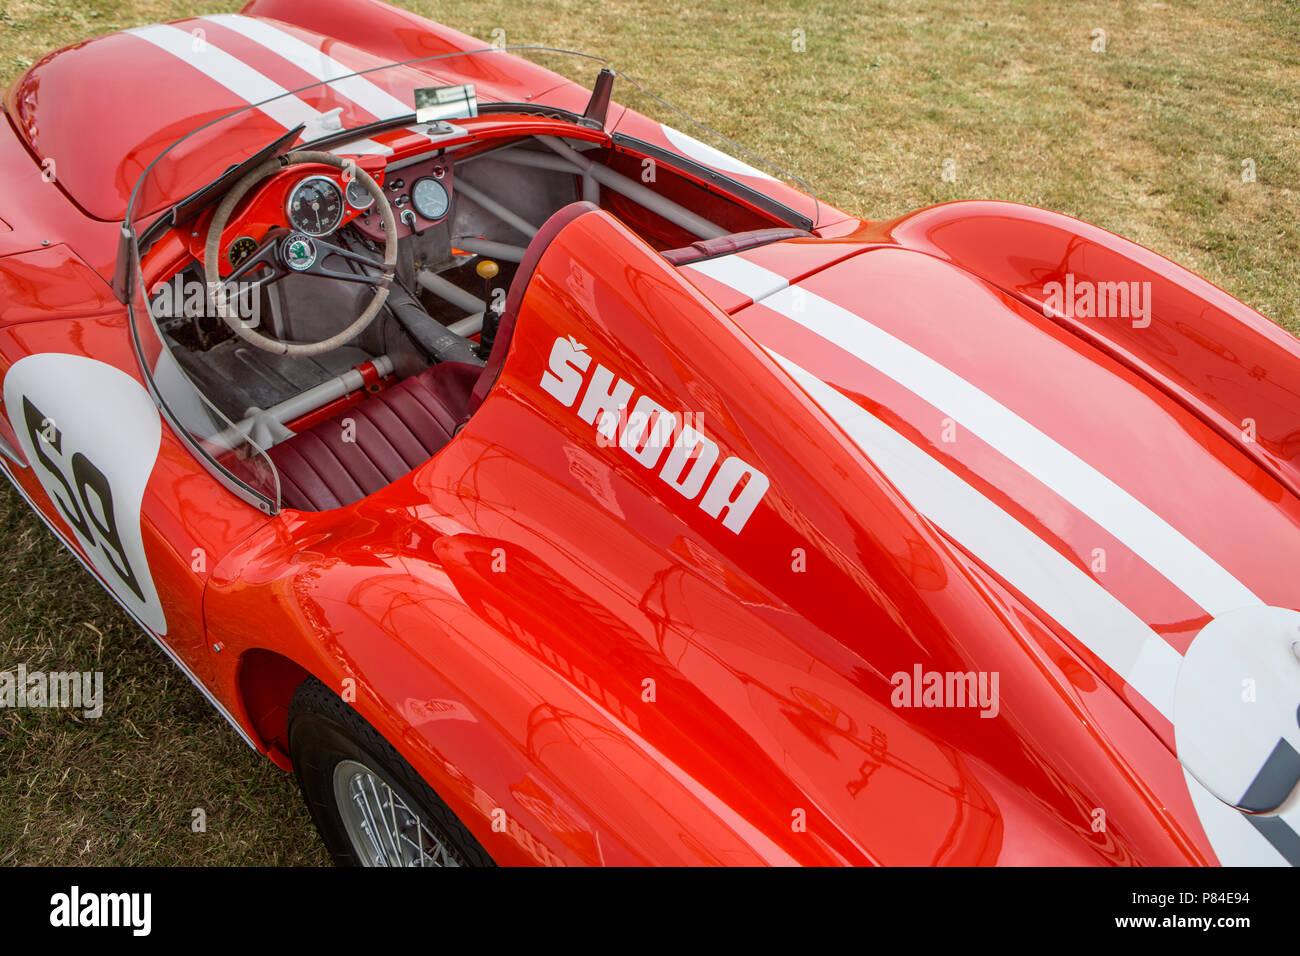 Skoda 1100 OHC sports car. - Stock Image